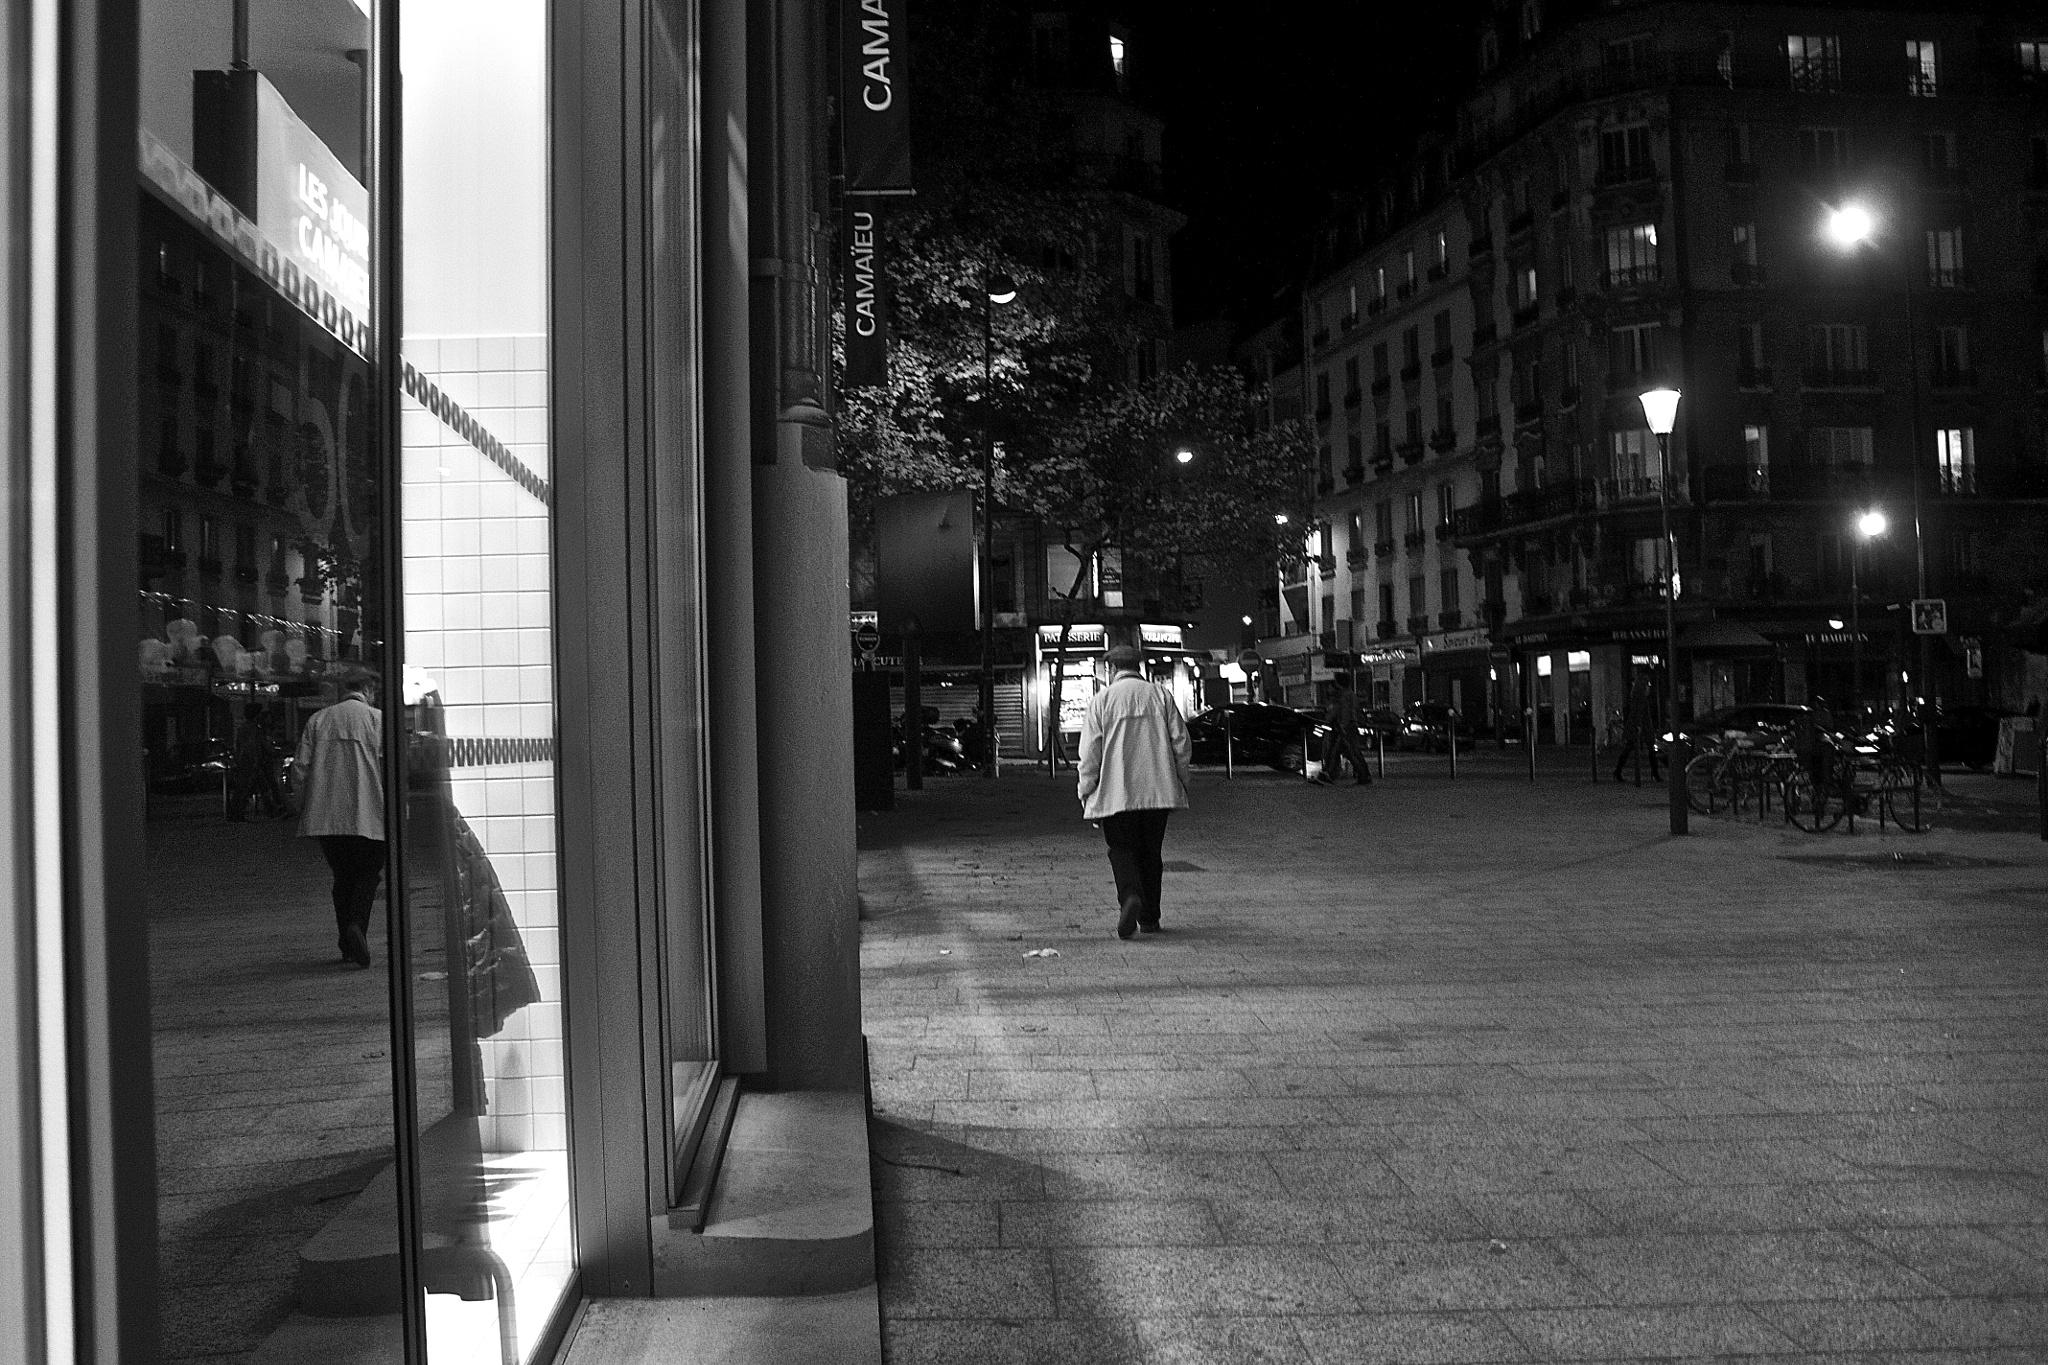 WALK ALONE - by FJA RAYNAL